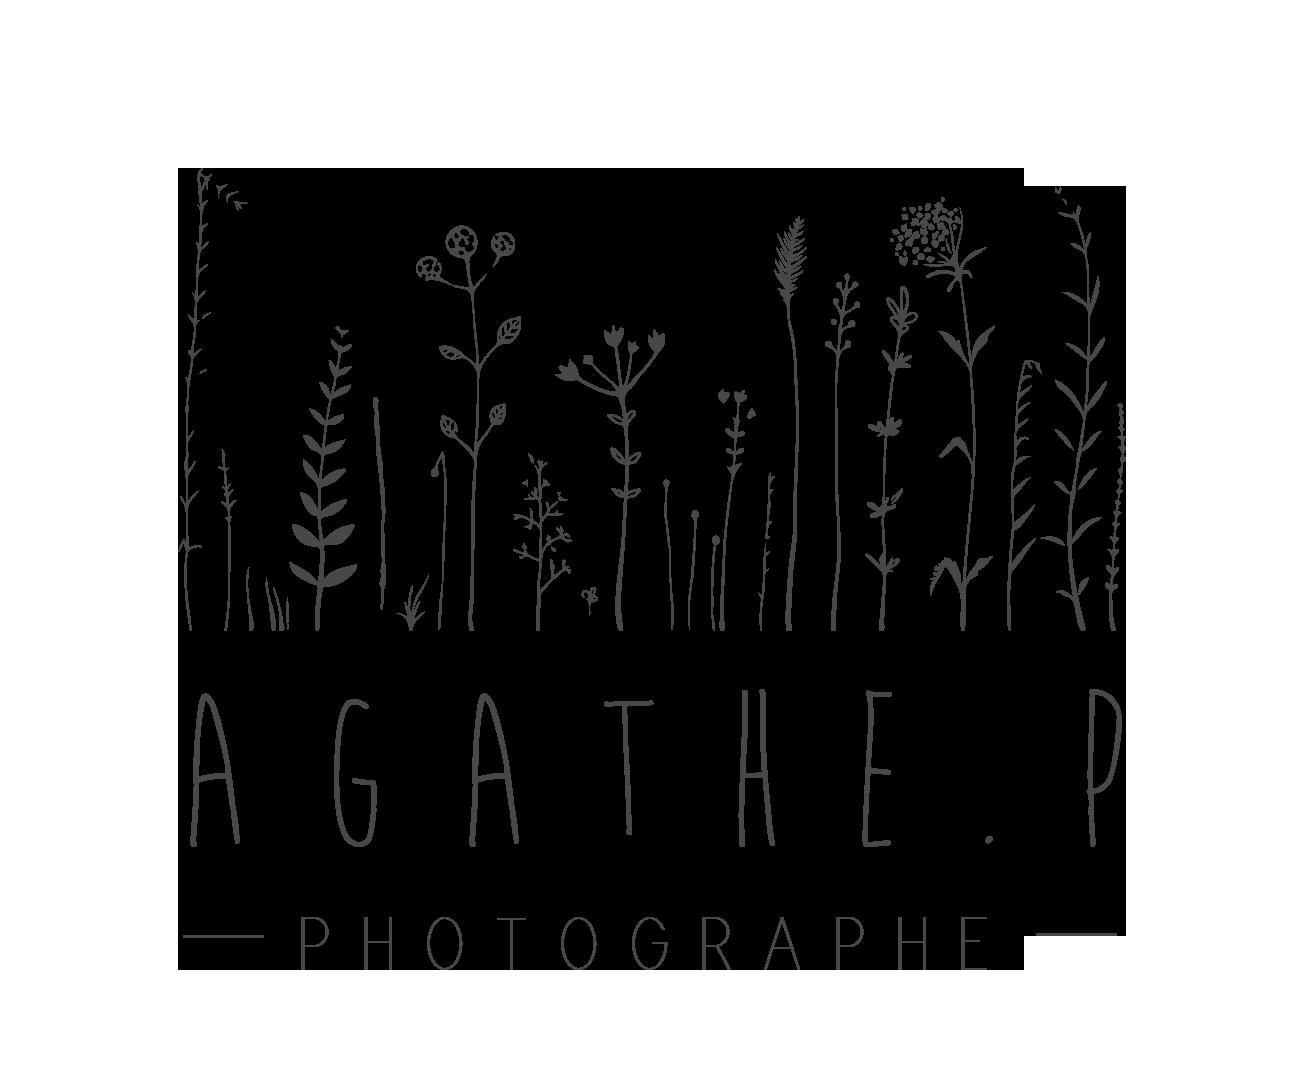 Agathe P Photographe